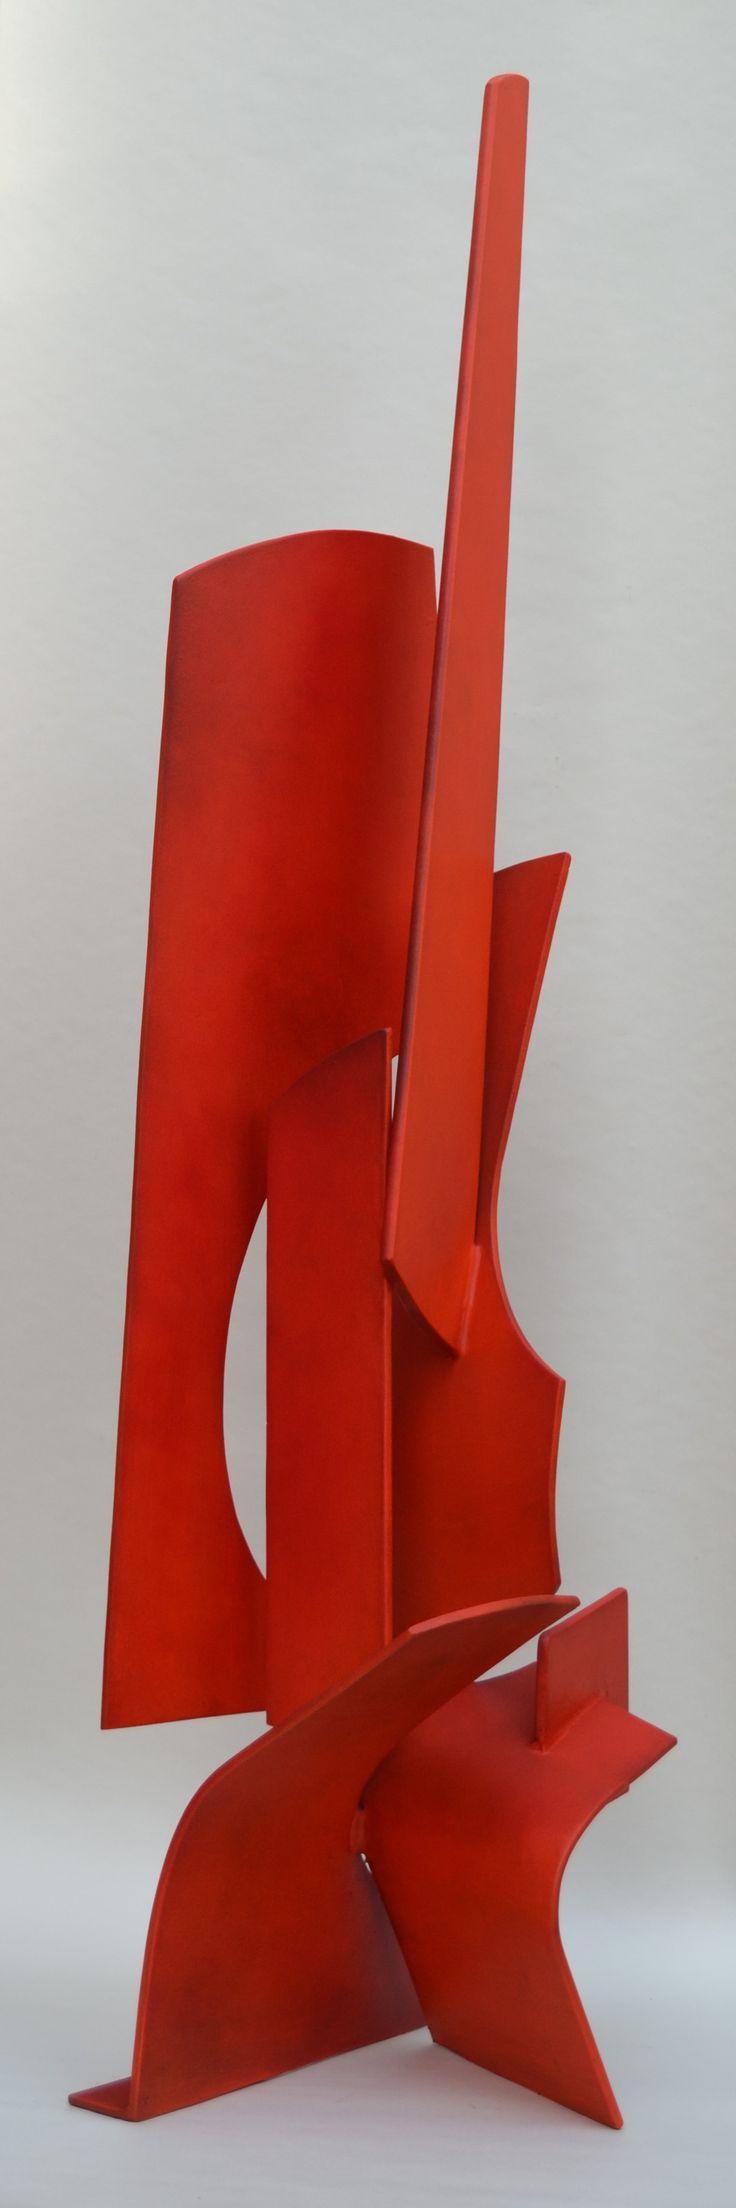 'Skip' sculpture by Nick Moran